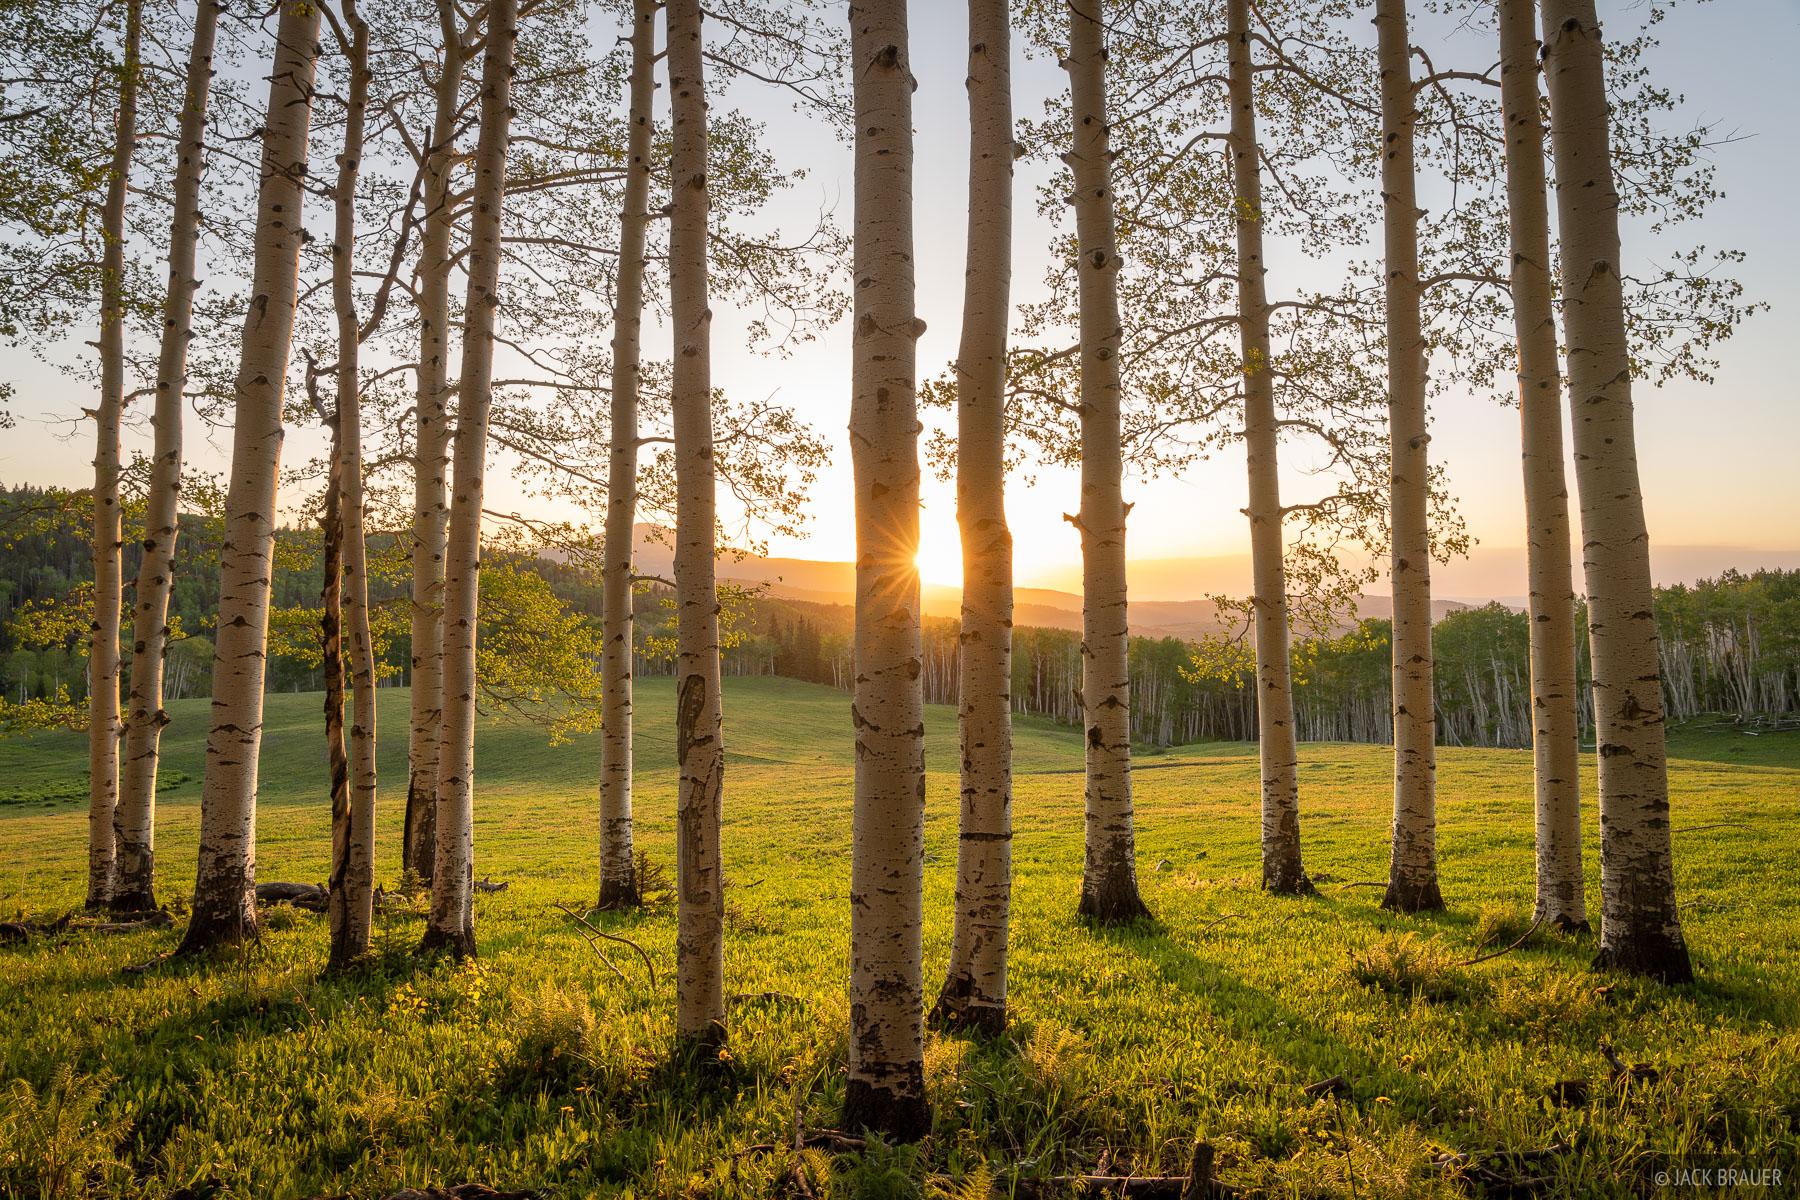 Sunset light filters through aspens in the San Miguel Range near Telluride, Colorado.